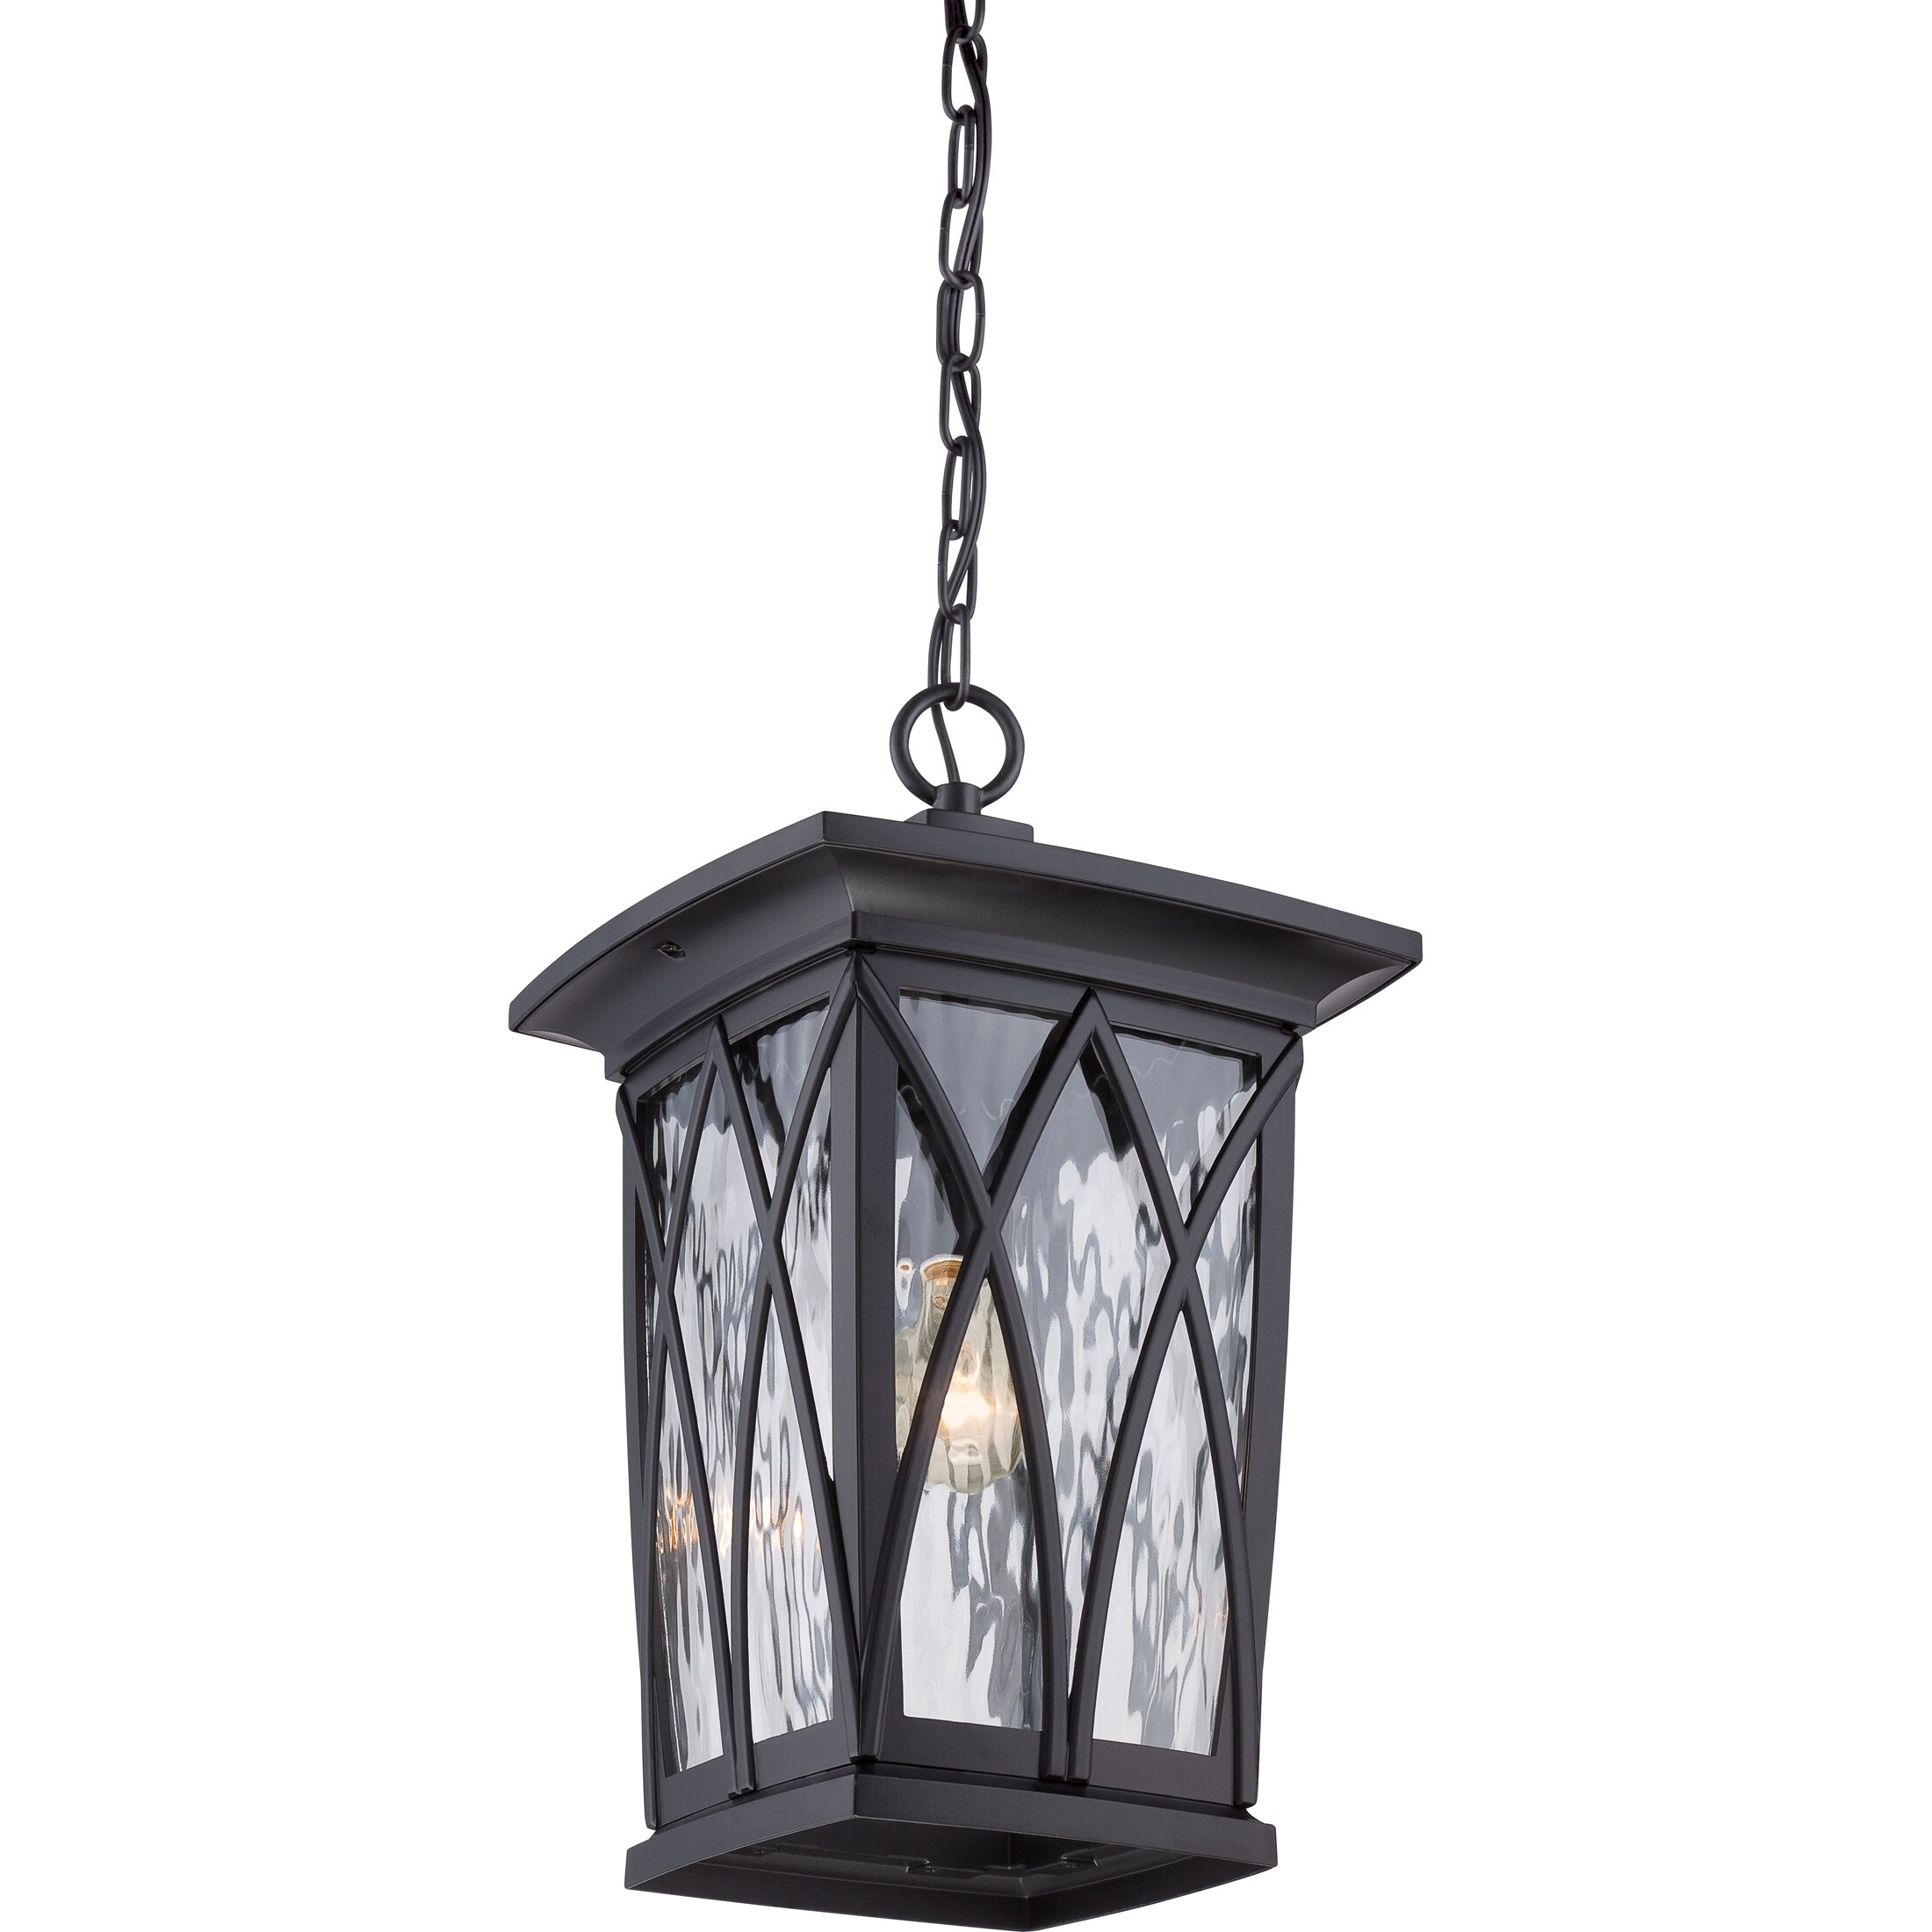 Wayfair Outdoor Hanging Lights: Quoizel Grover 1 Light Outdoor Hanging Lantern